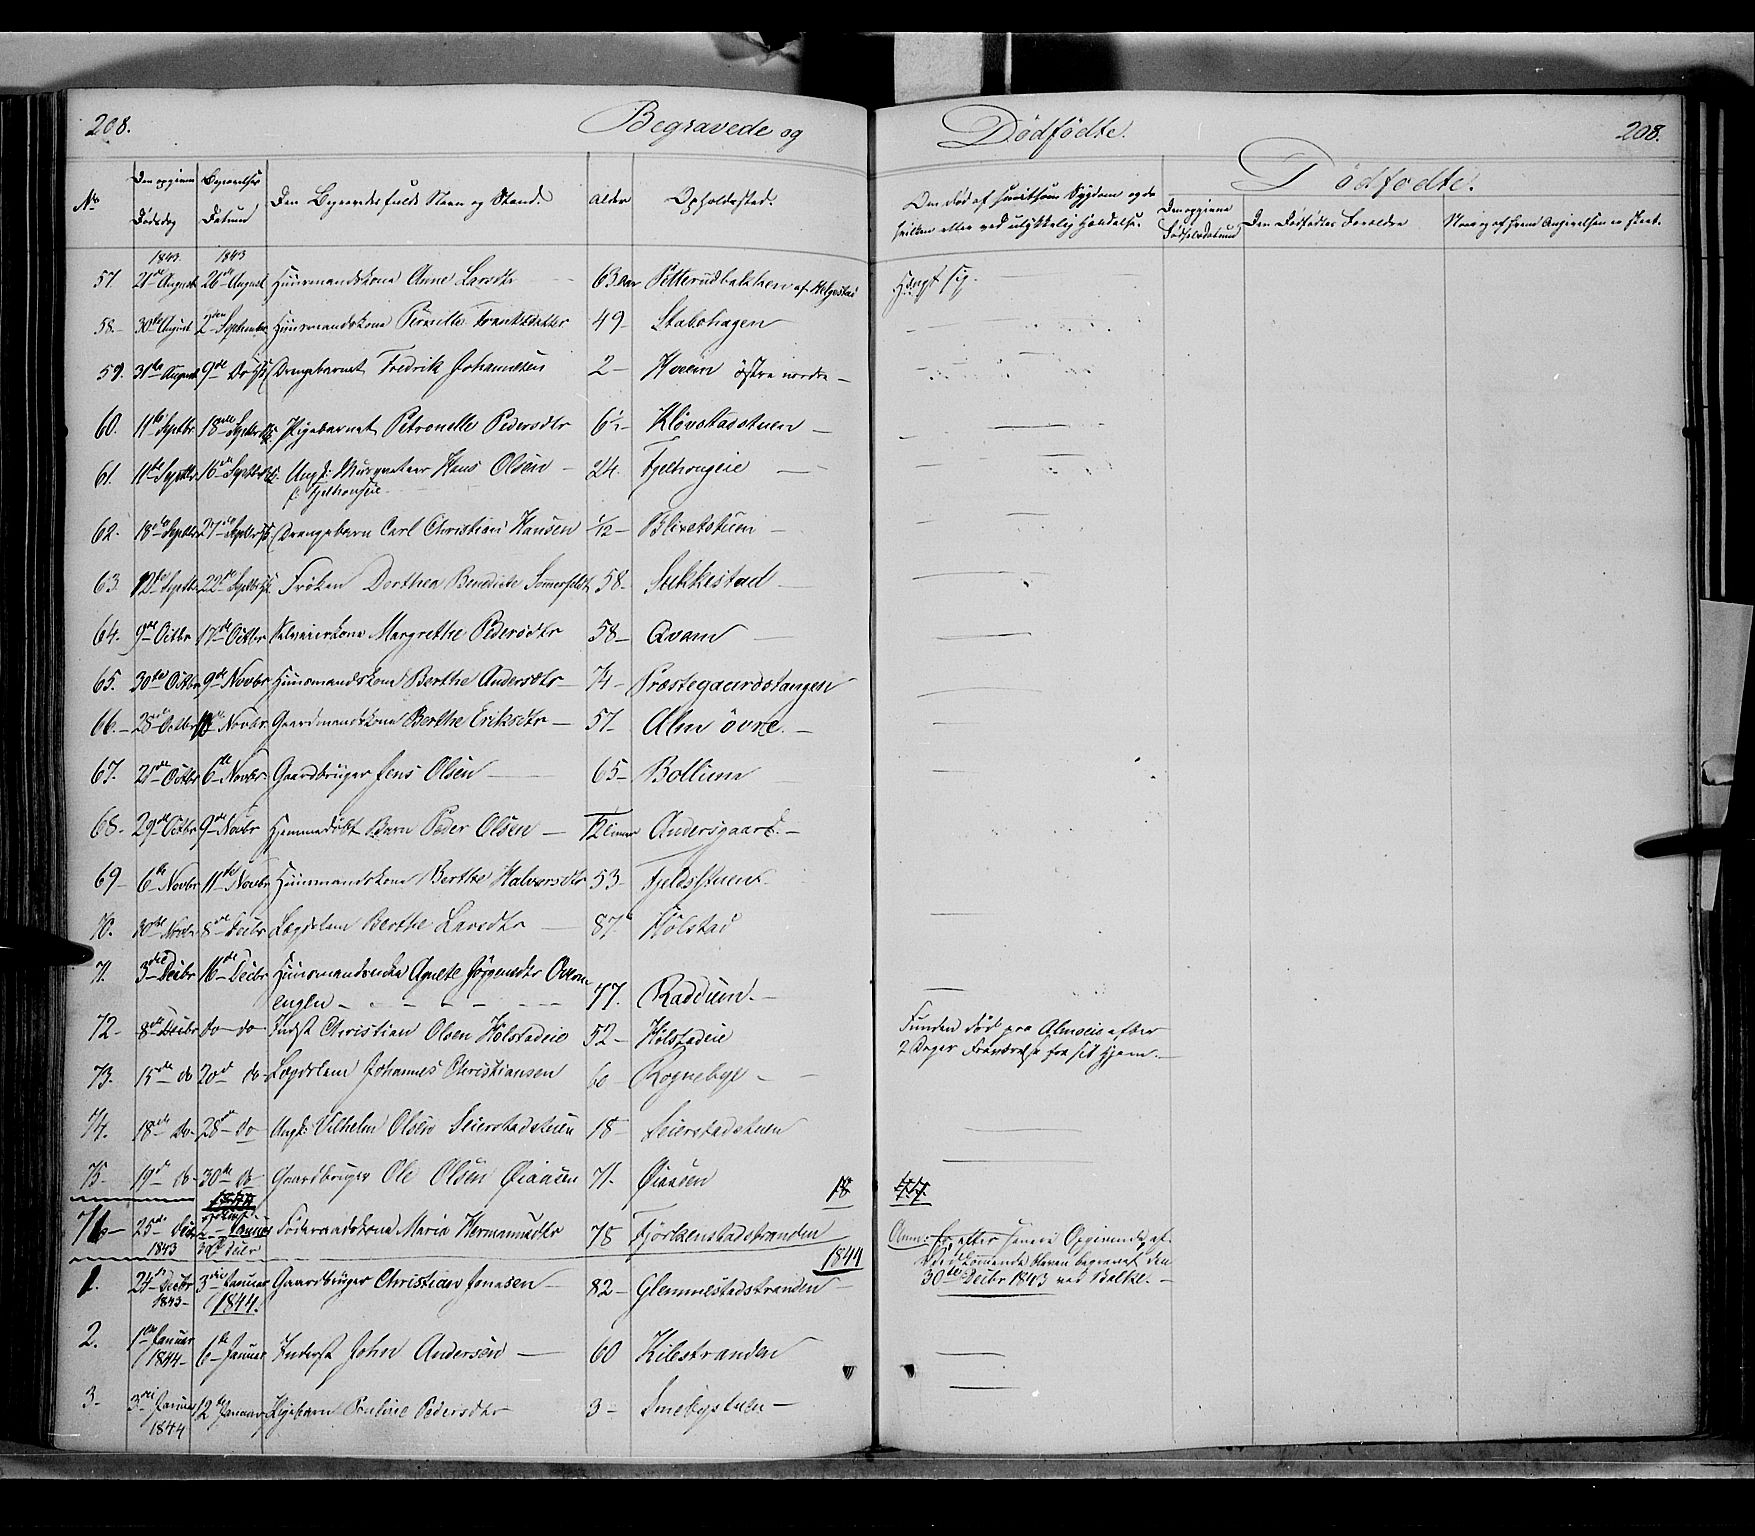 SAH, Østre Toten prestekontor, Ministerialbok nr. 2, 1840-1847, s. 208